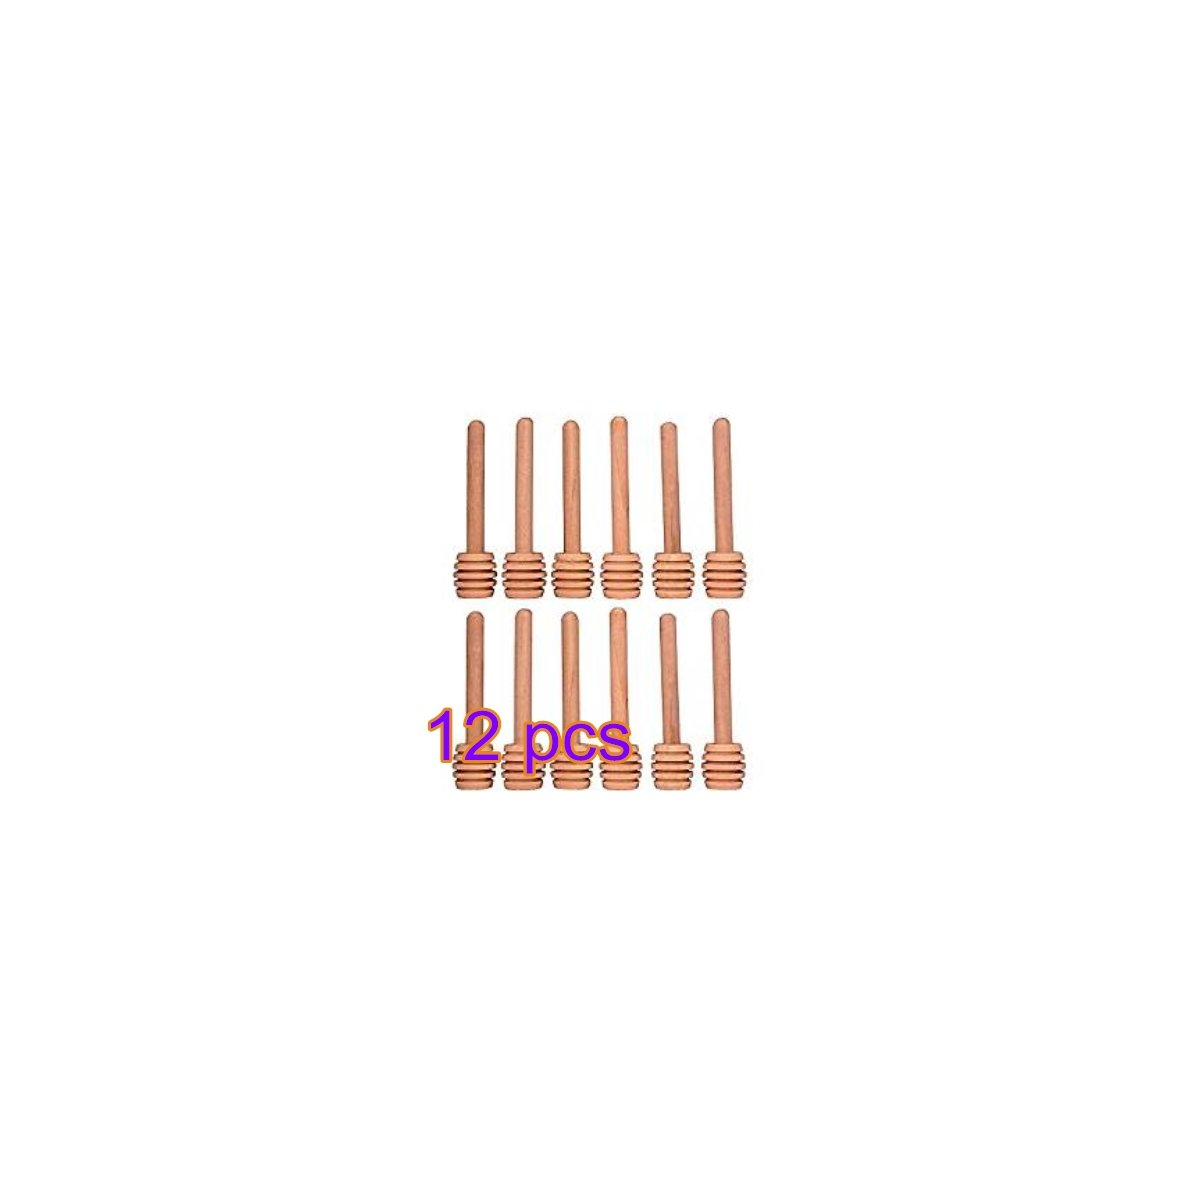 Set of 12 Mini Honey Dipper 3.2 Inch Wood Sticks for Honey Jar Pot Dispense Drizzle Honey Fendii